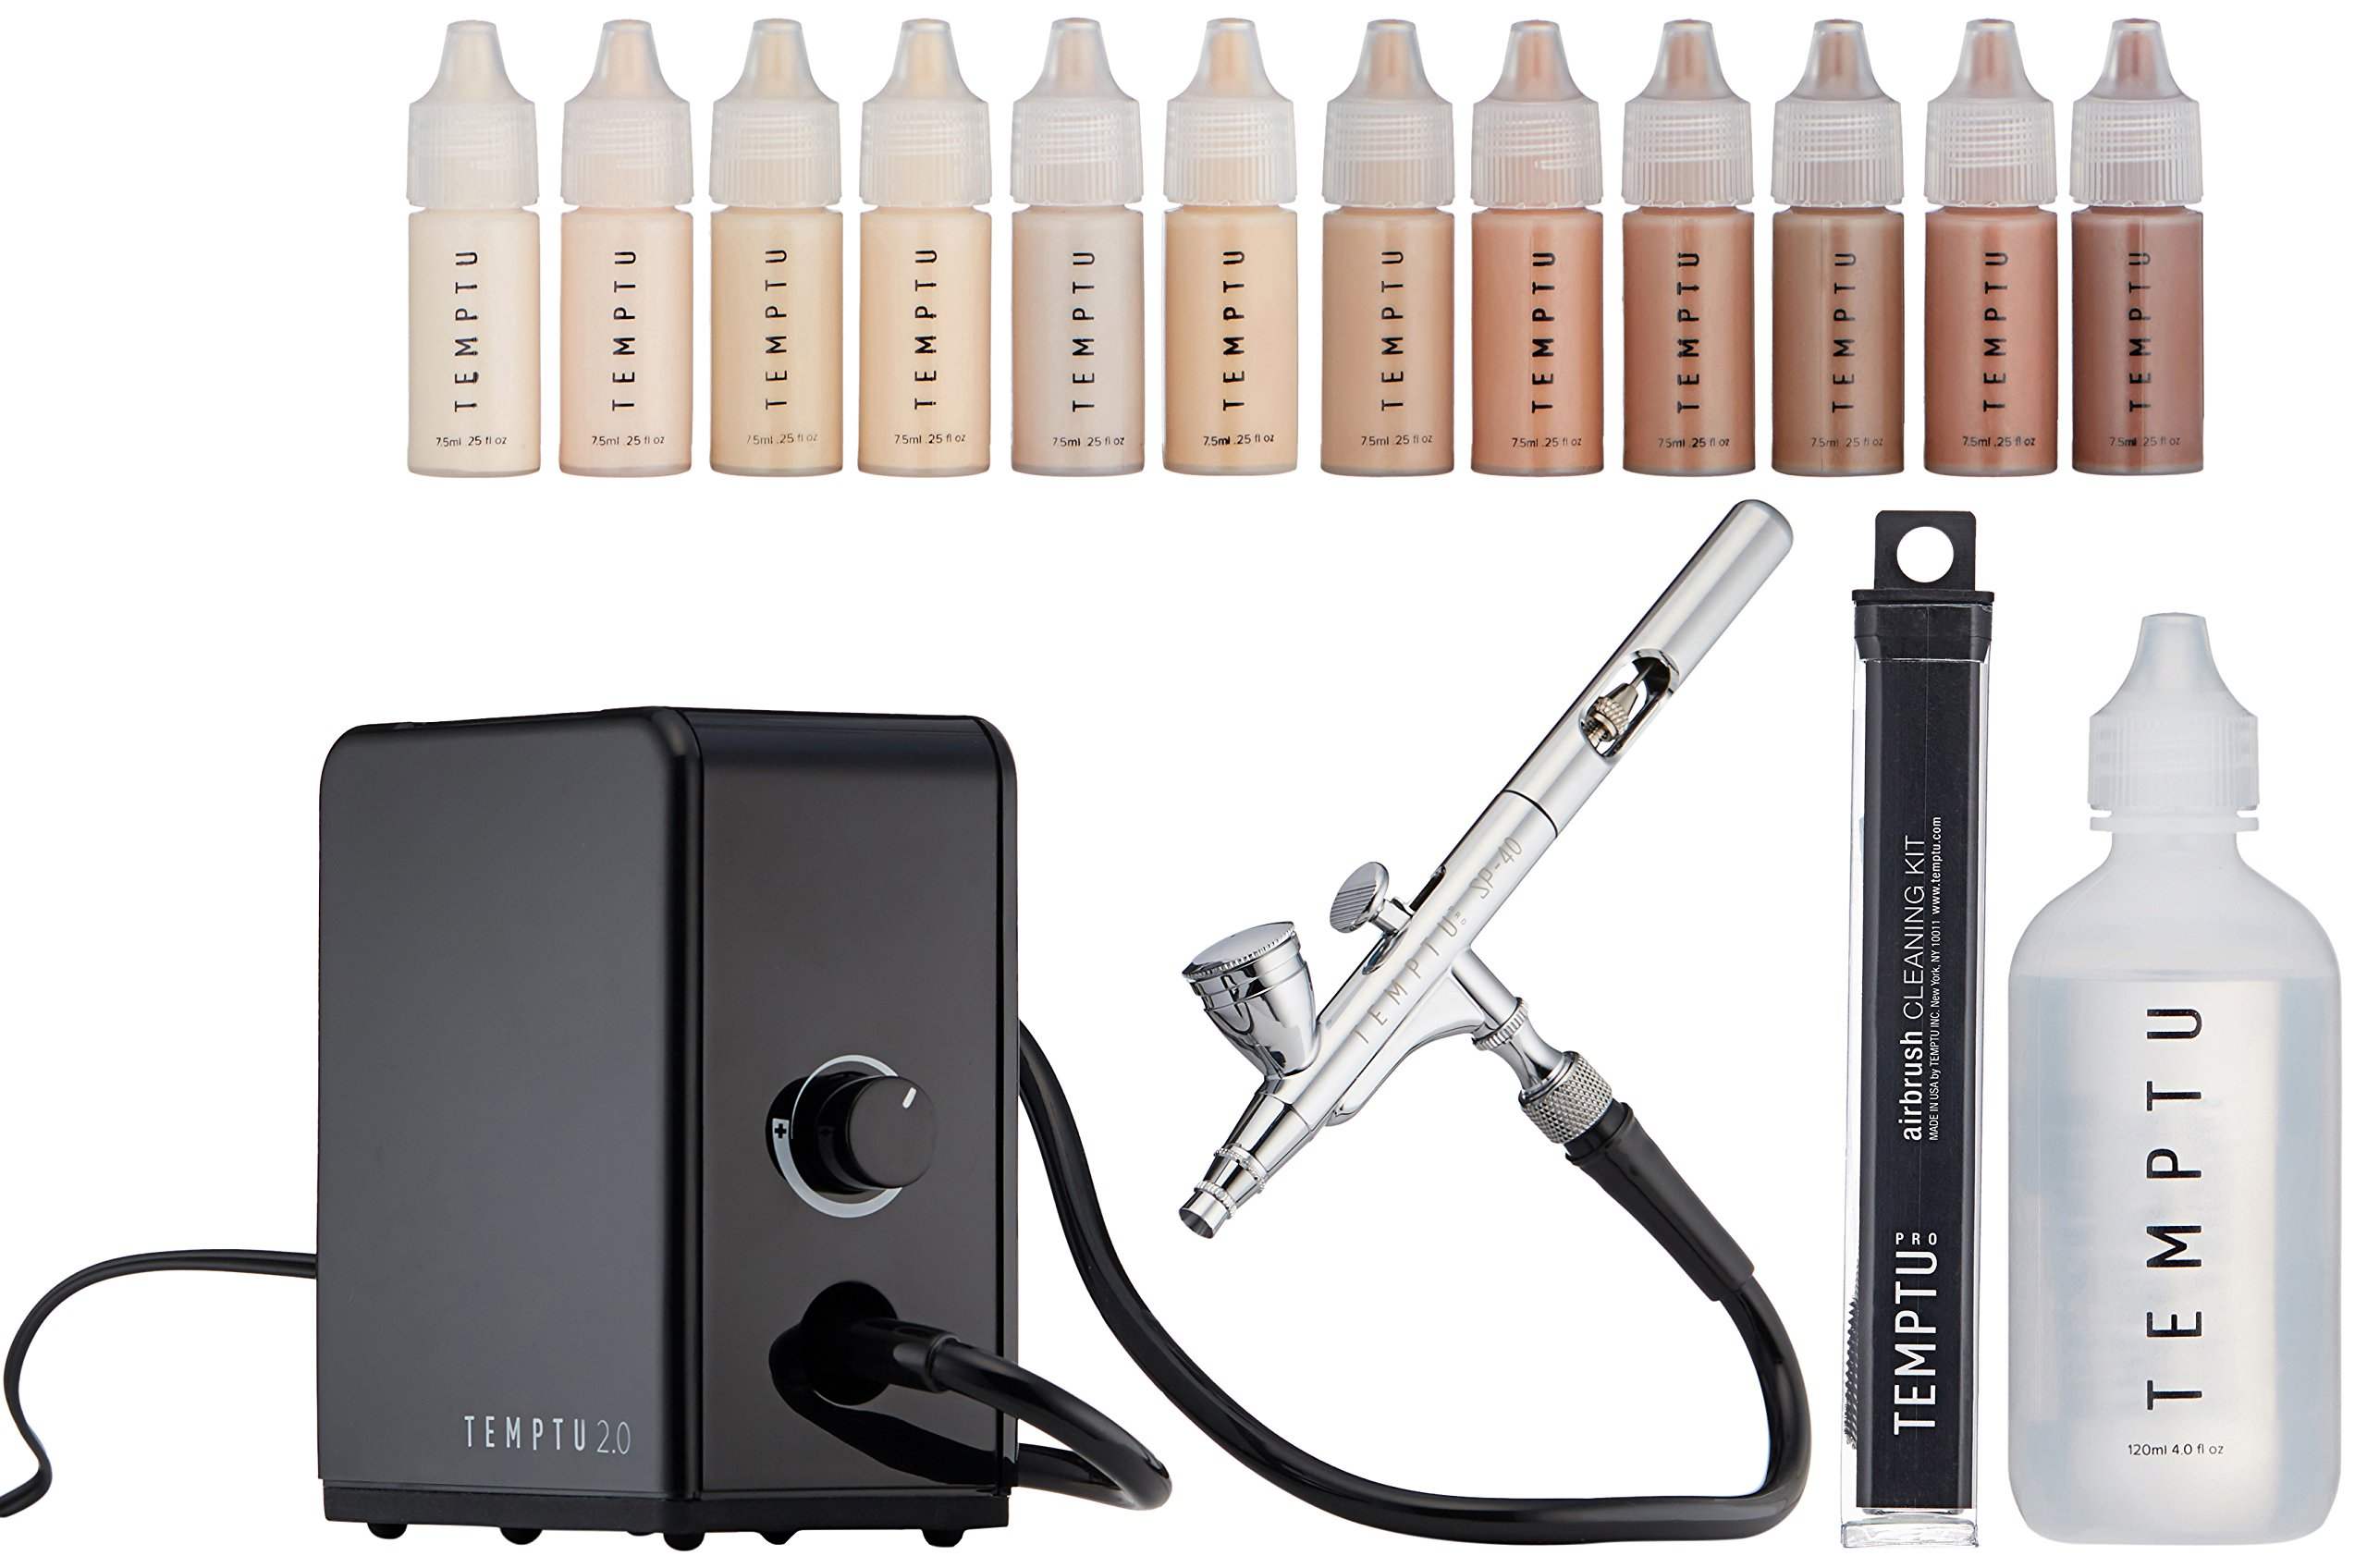 Temptu Airbrush Makeup System 2.0 Premier Kit: Airbrush Makeup Set for Professionals by Temptu